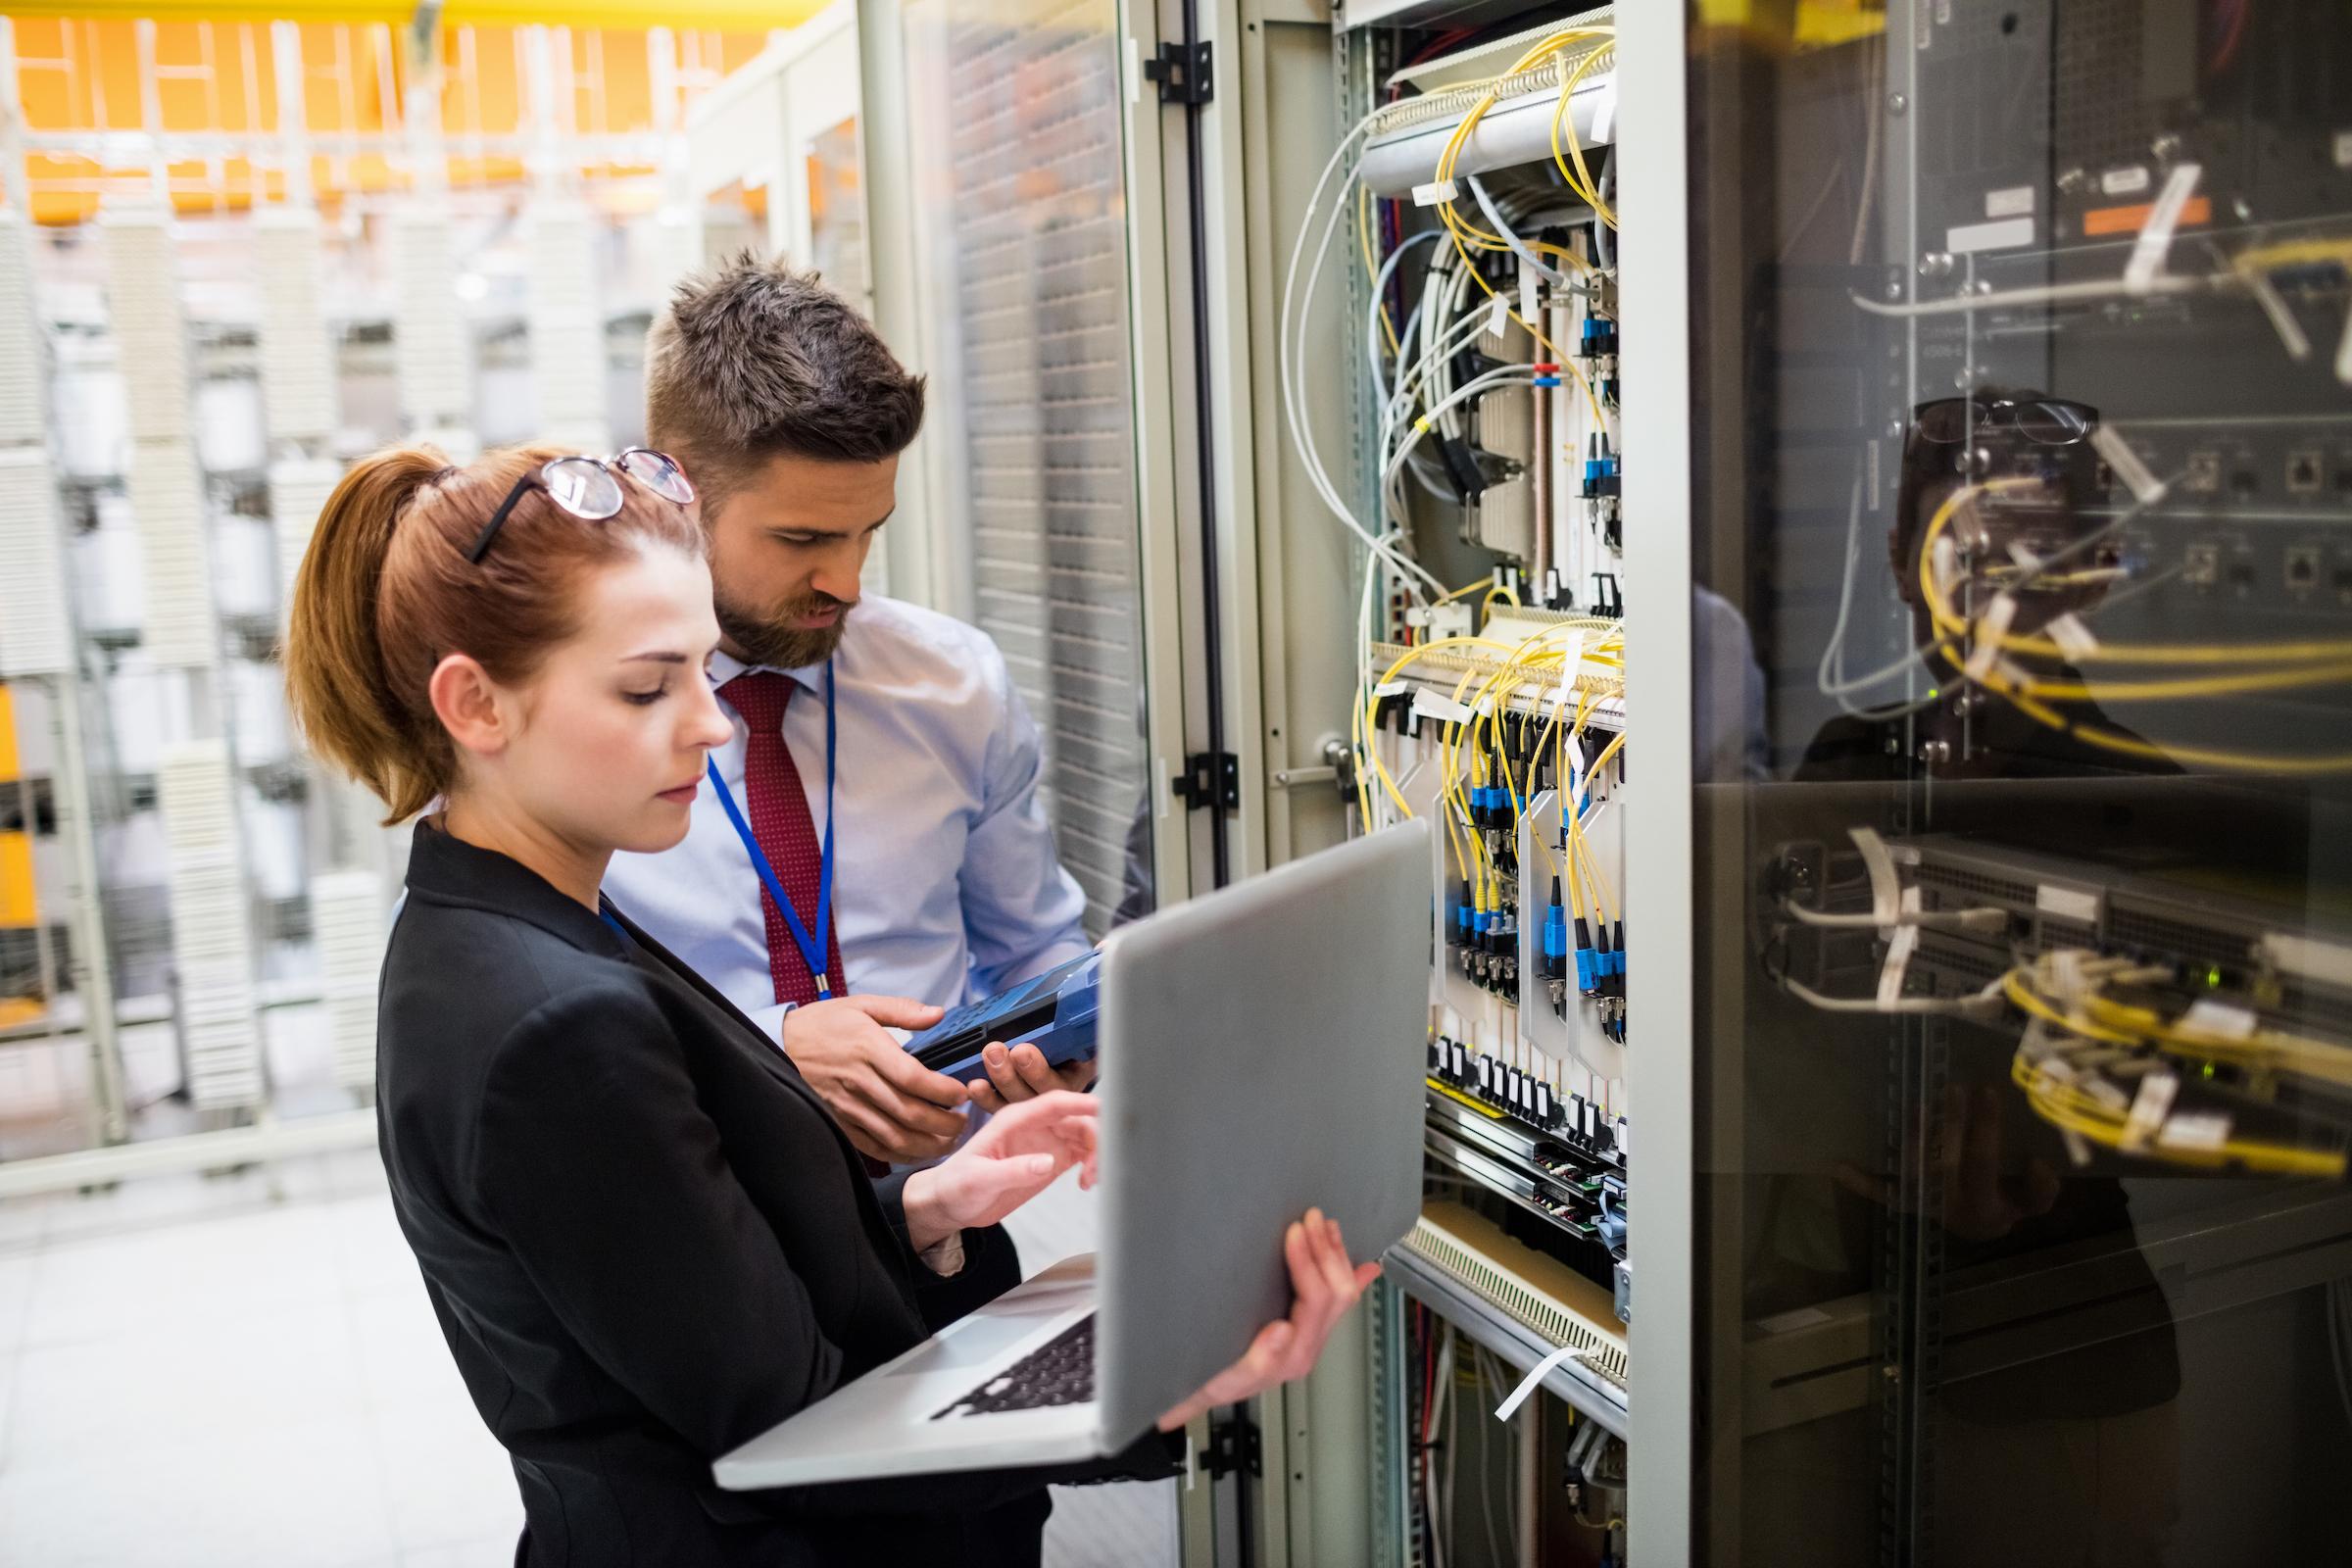 Managed Server Care Technicians